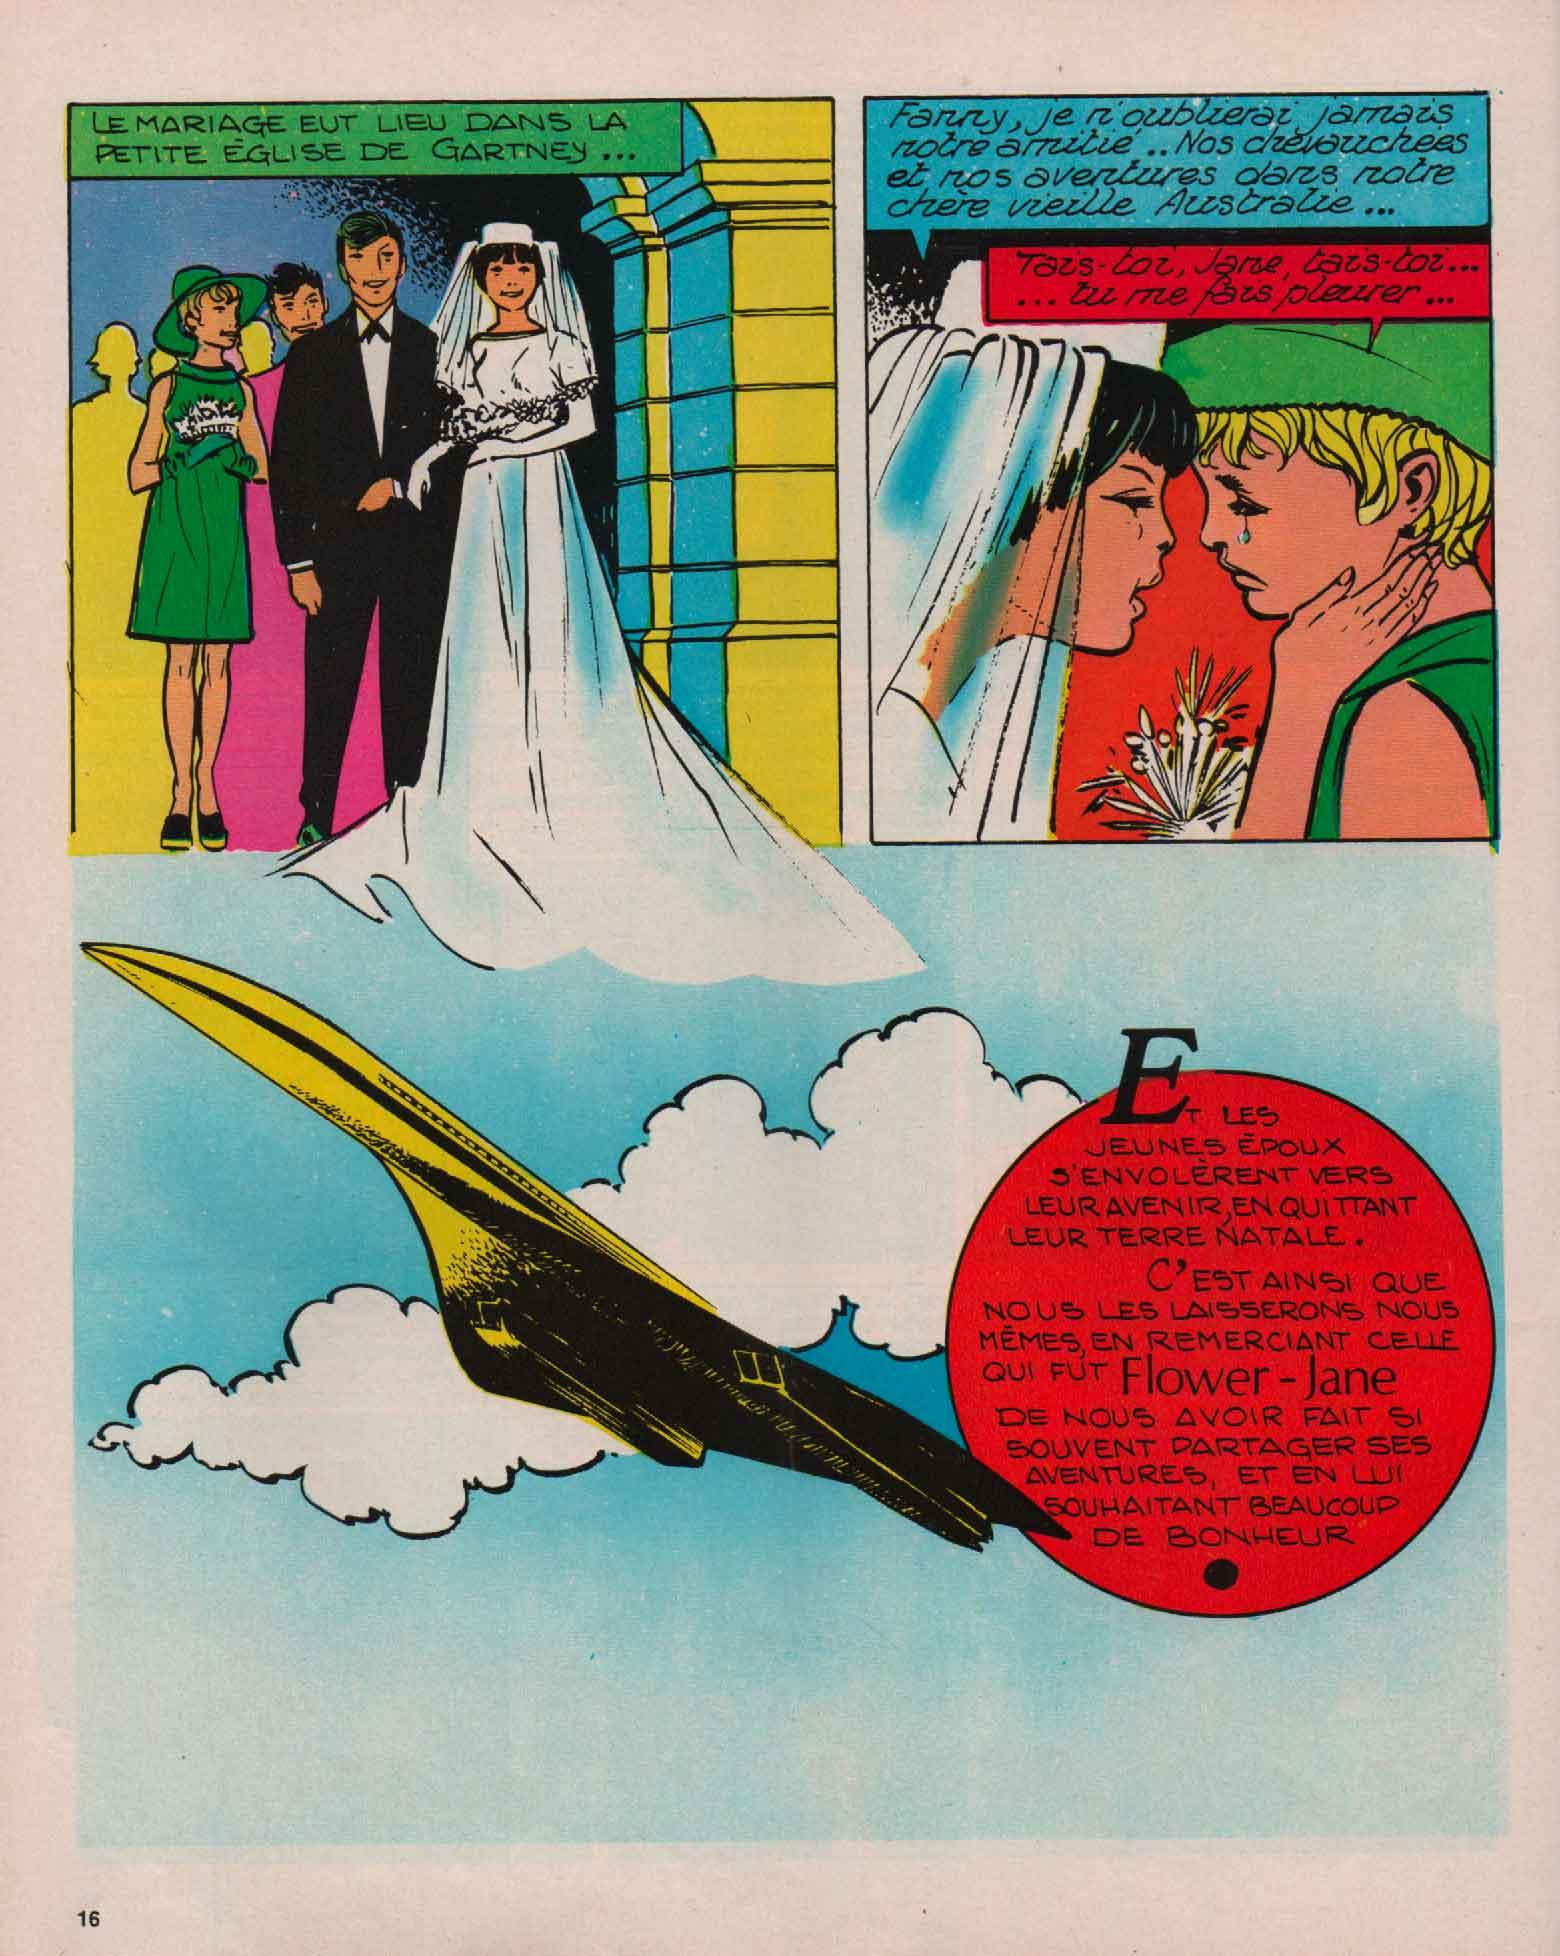 « Flower Jane » J2 magazine n° 8 (20/02/1974).